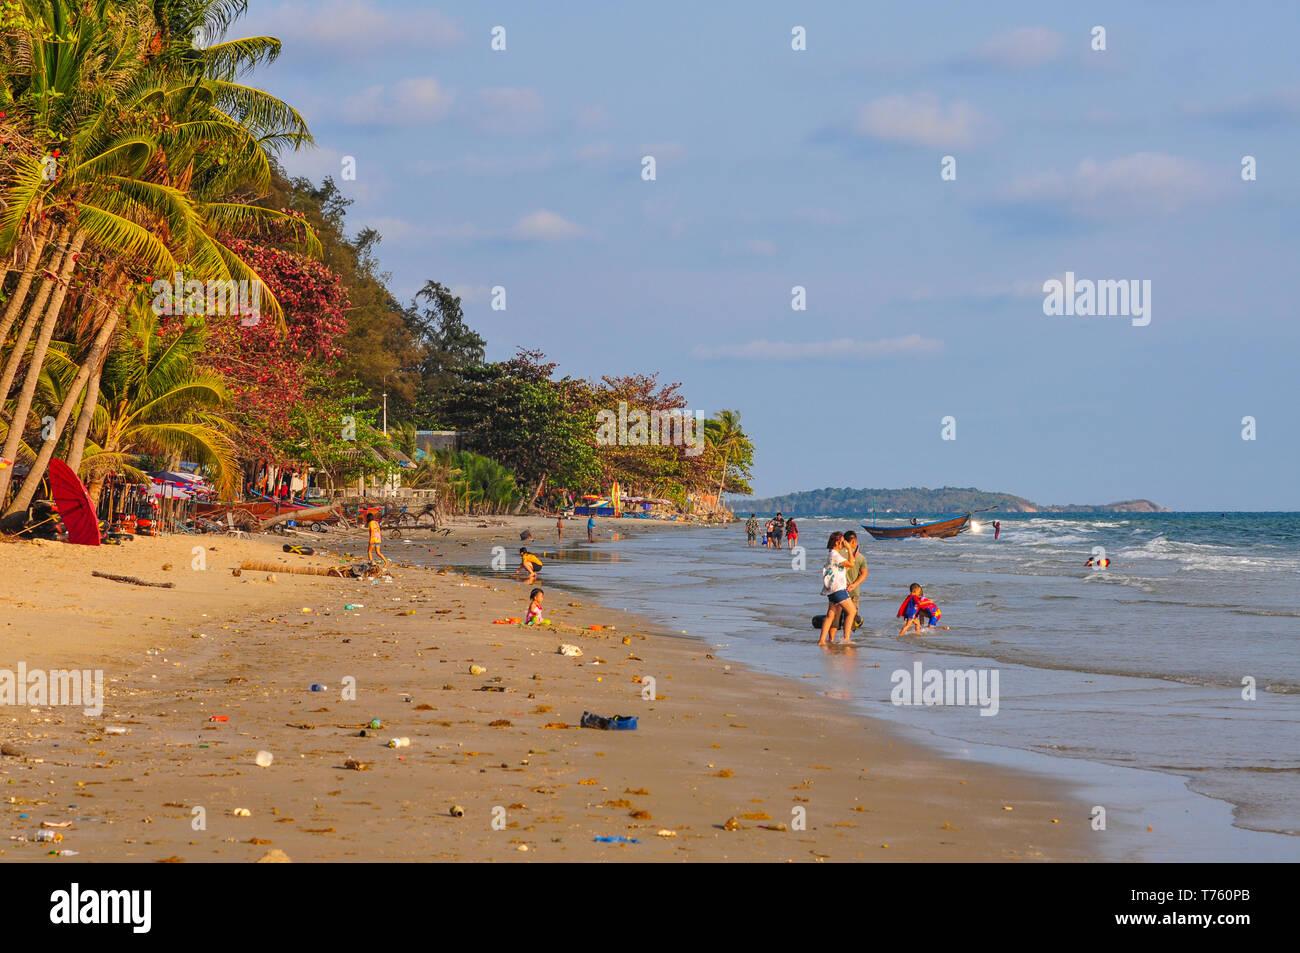 Thailand beach pollution - Stock Image